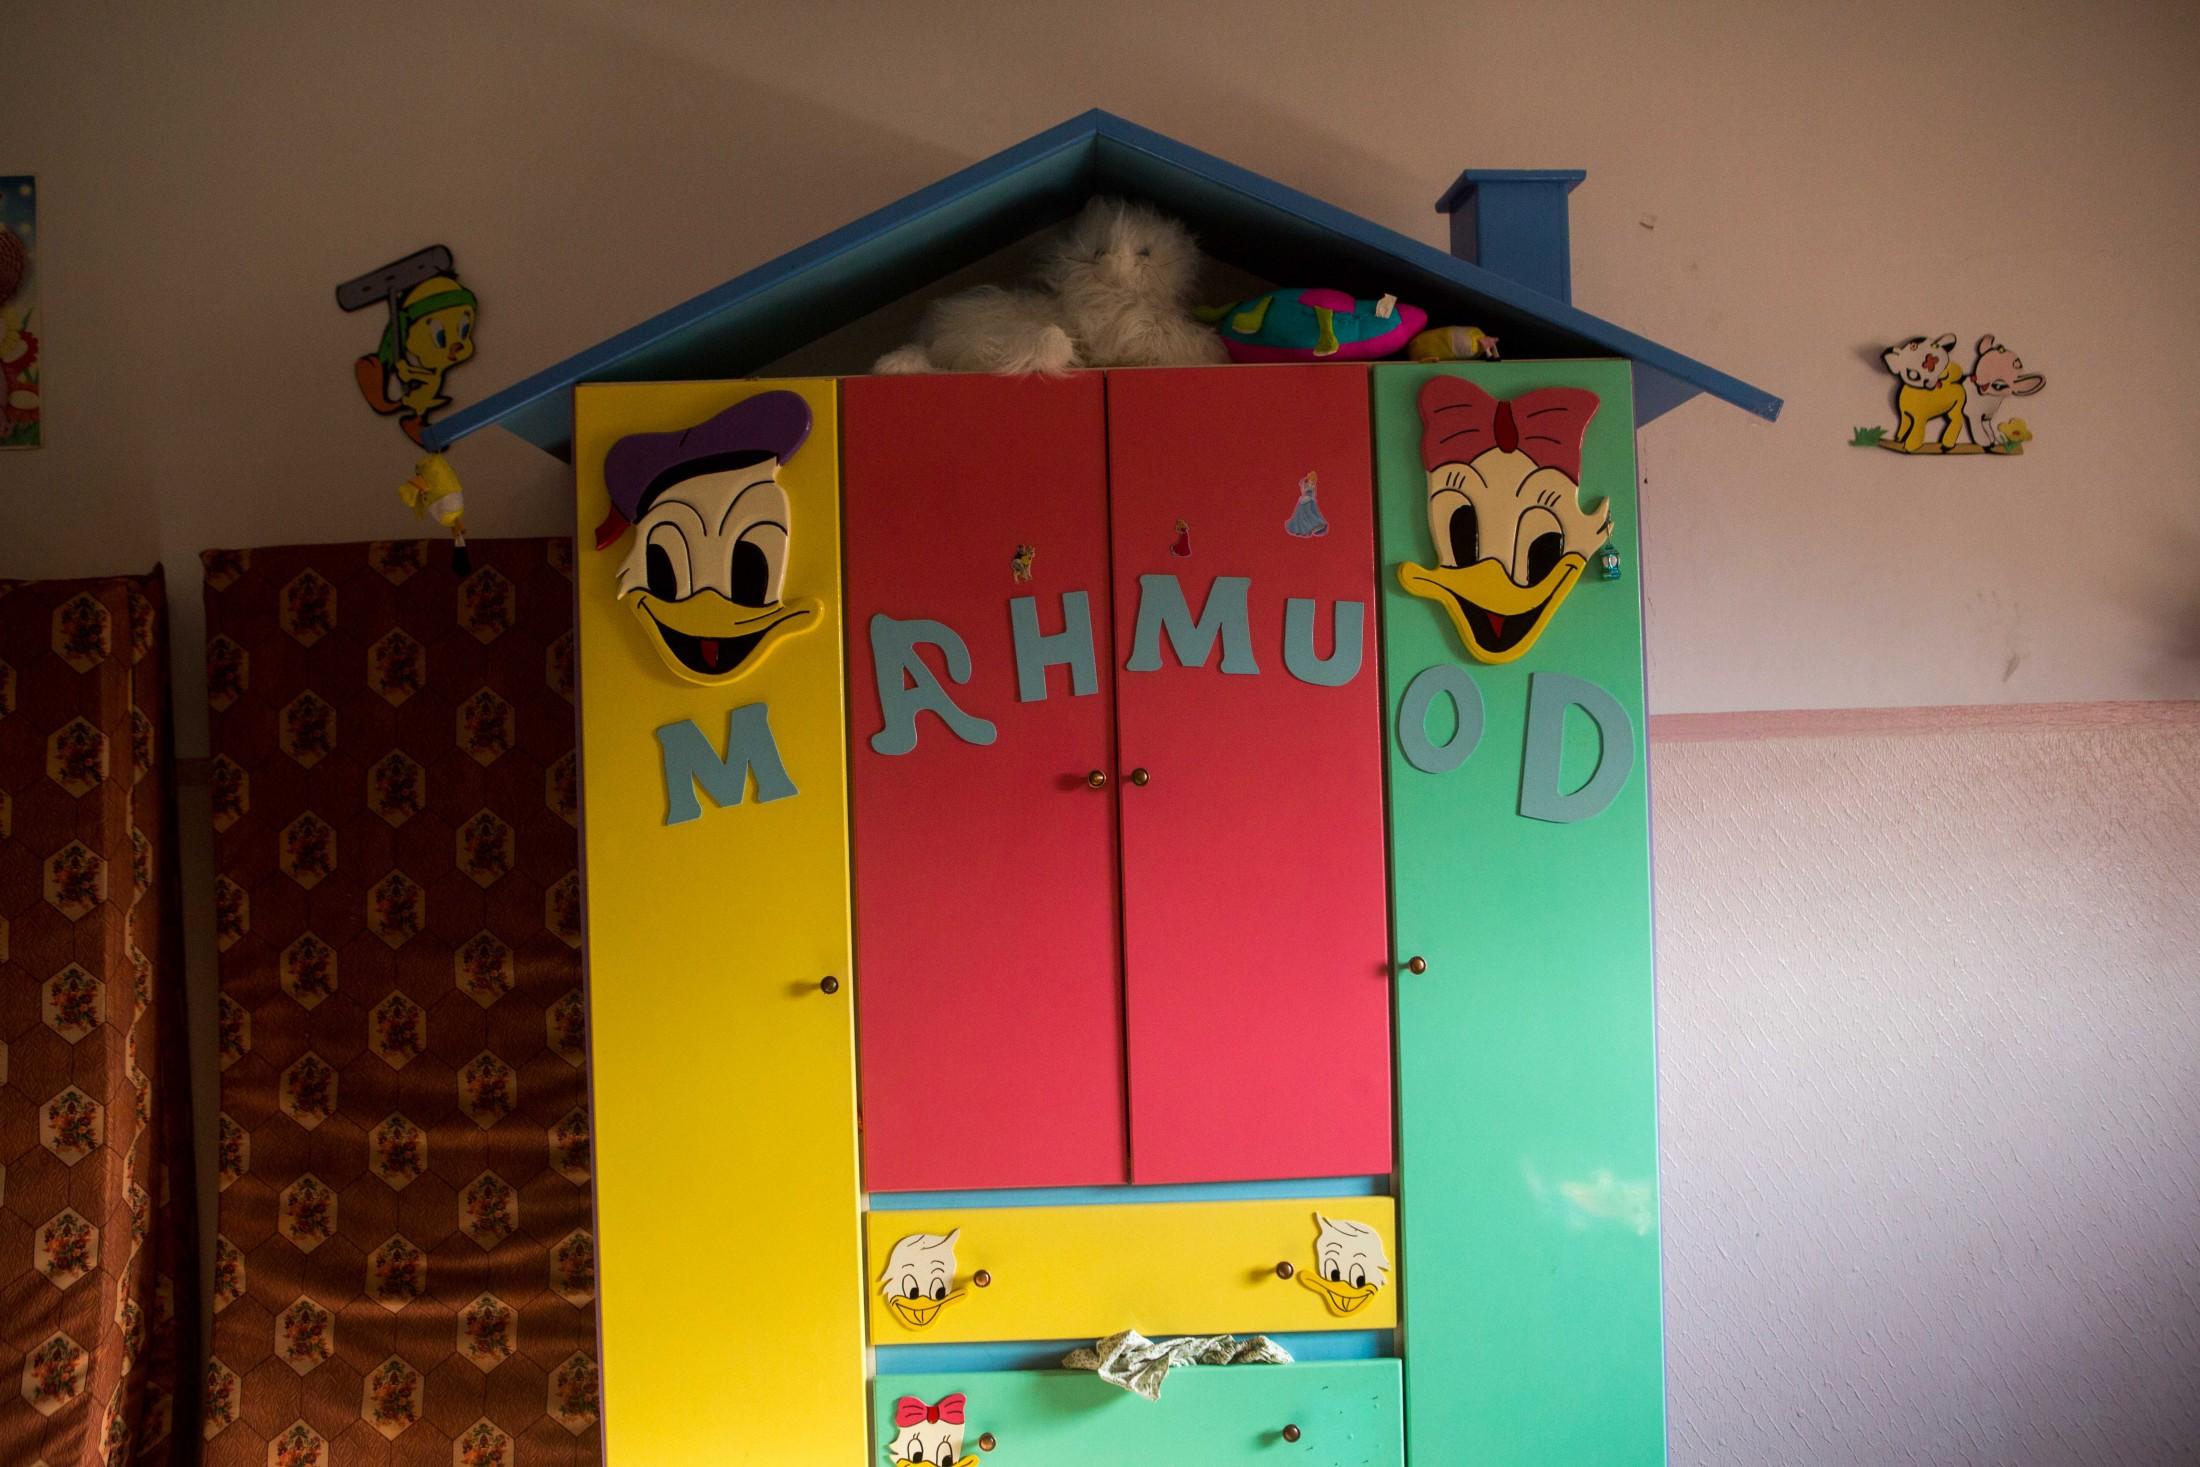 Mahmoud's room.